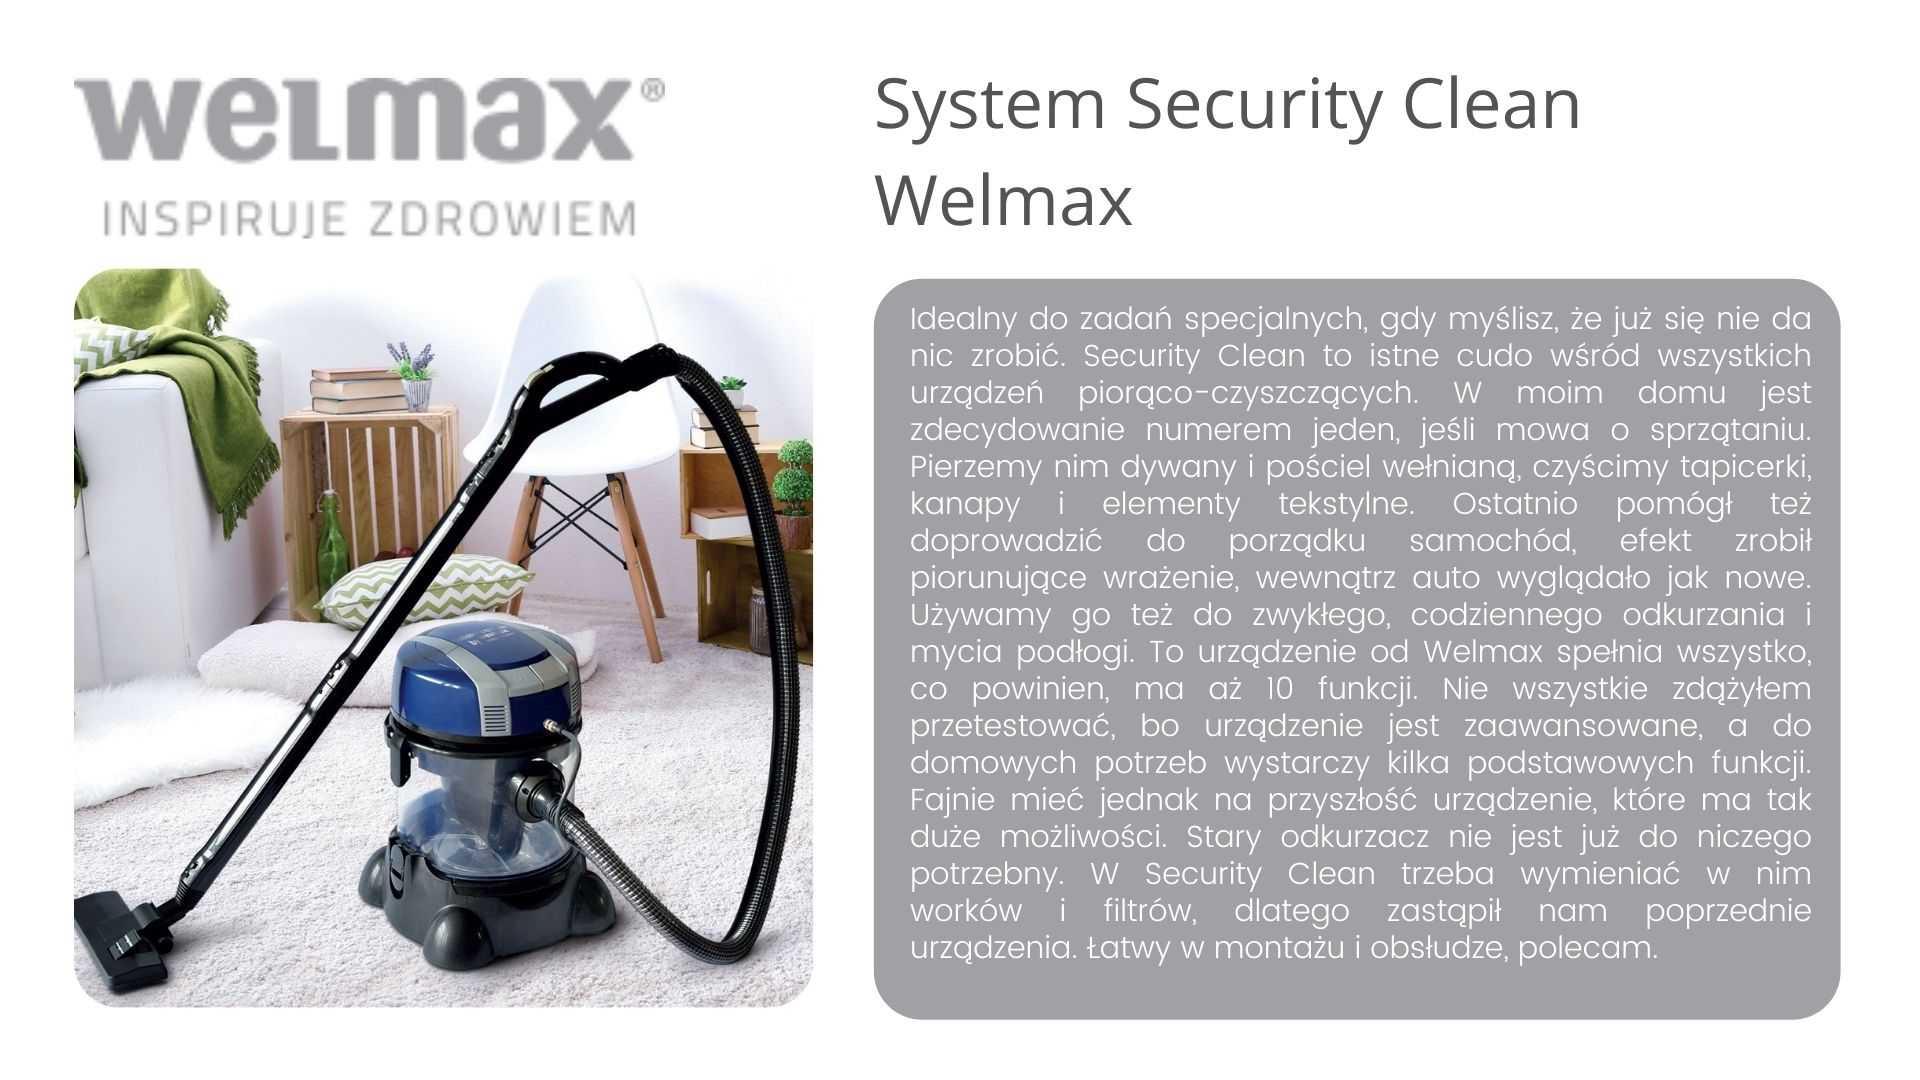 Seciurity Clean opinie Welmax